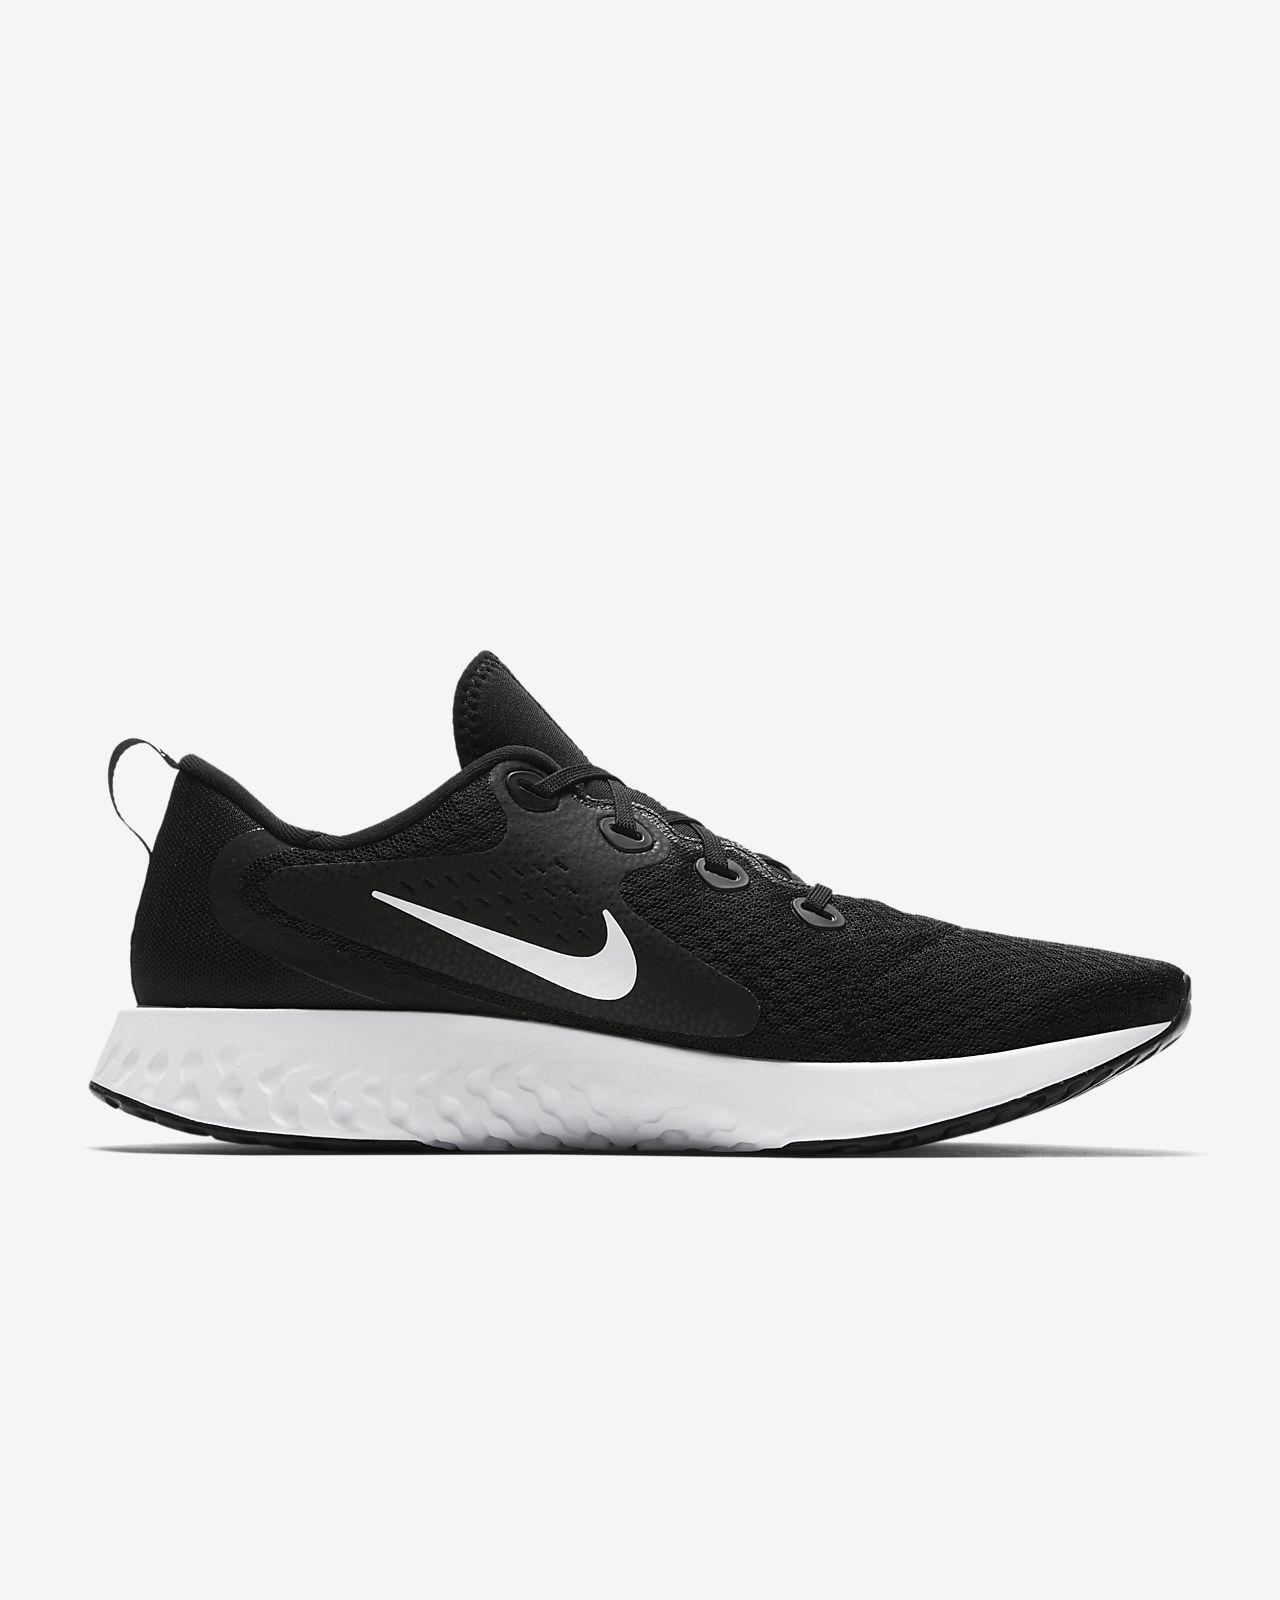 9301ab13784 Chaussure de running Nike Legend React pour Homme. Nike.com FR